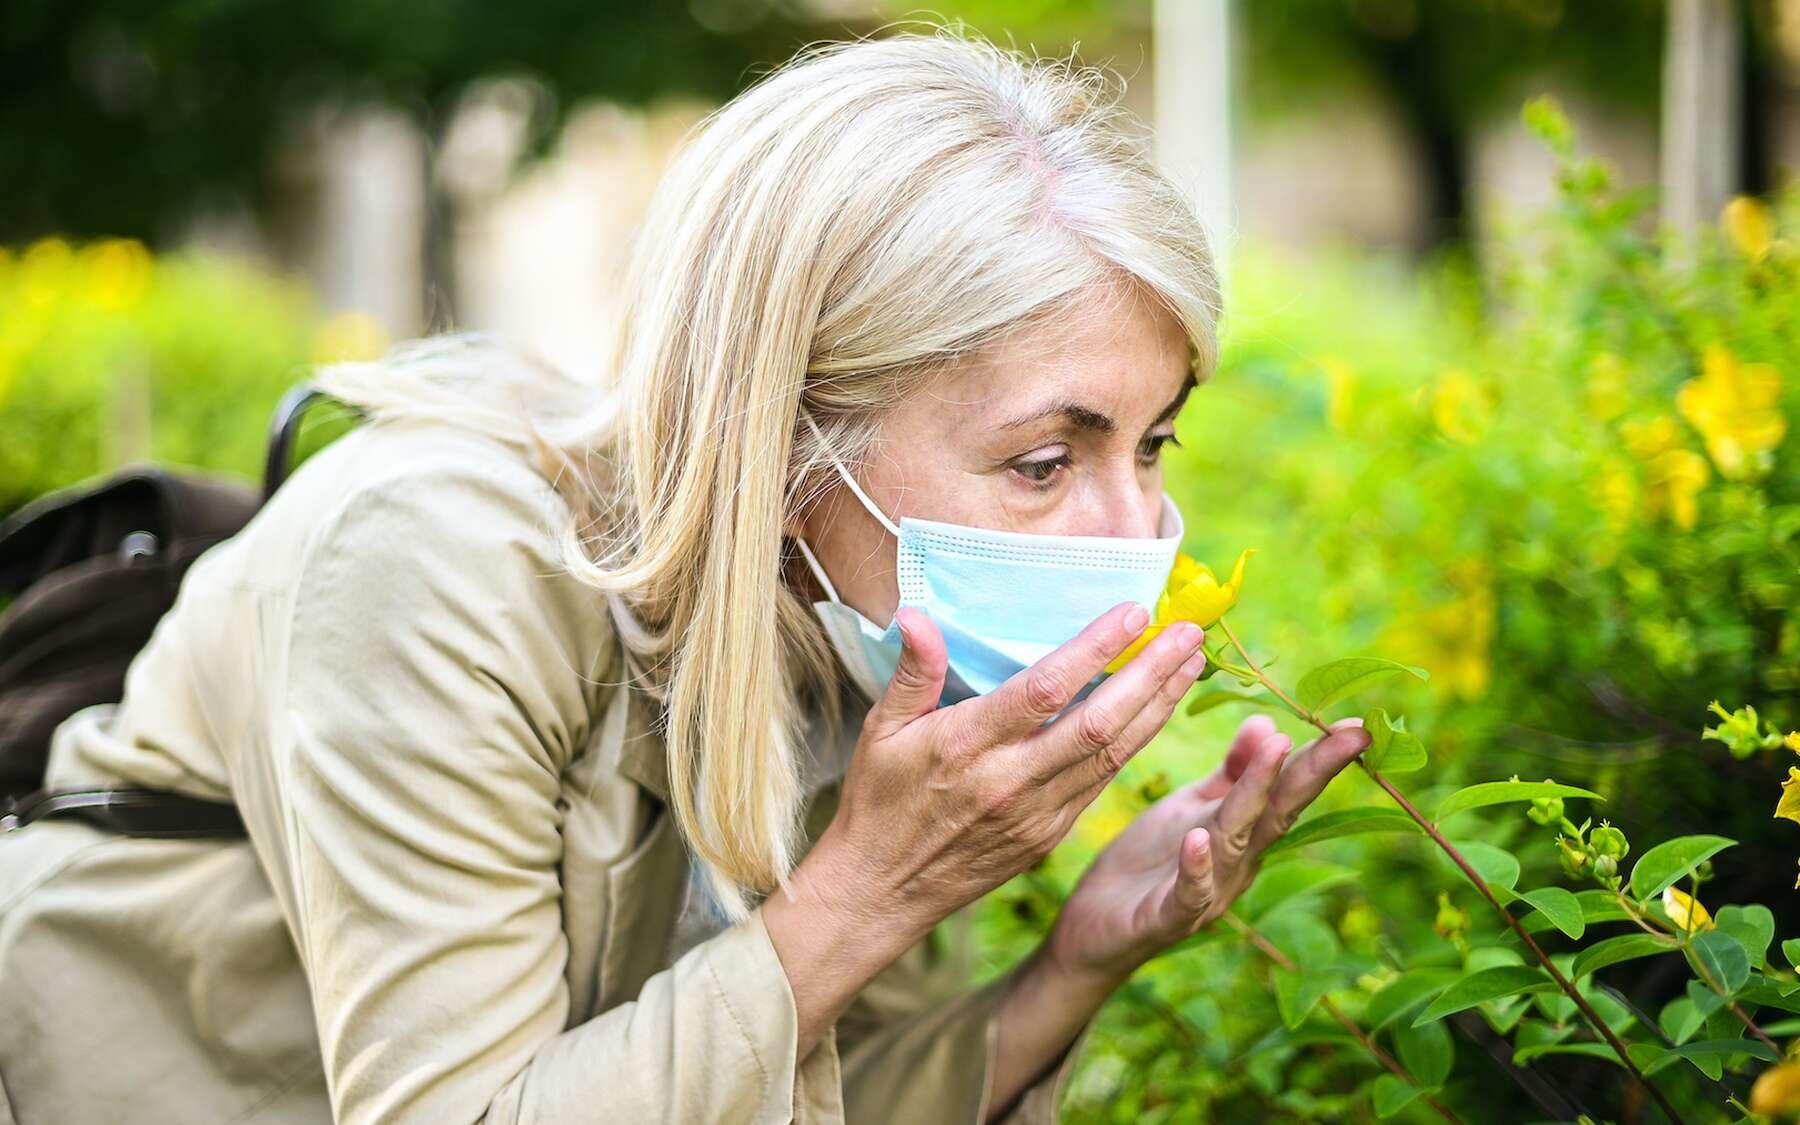 L'anosmie est un des symptômes de la Covid-19. © buritora, Adobe Stock